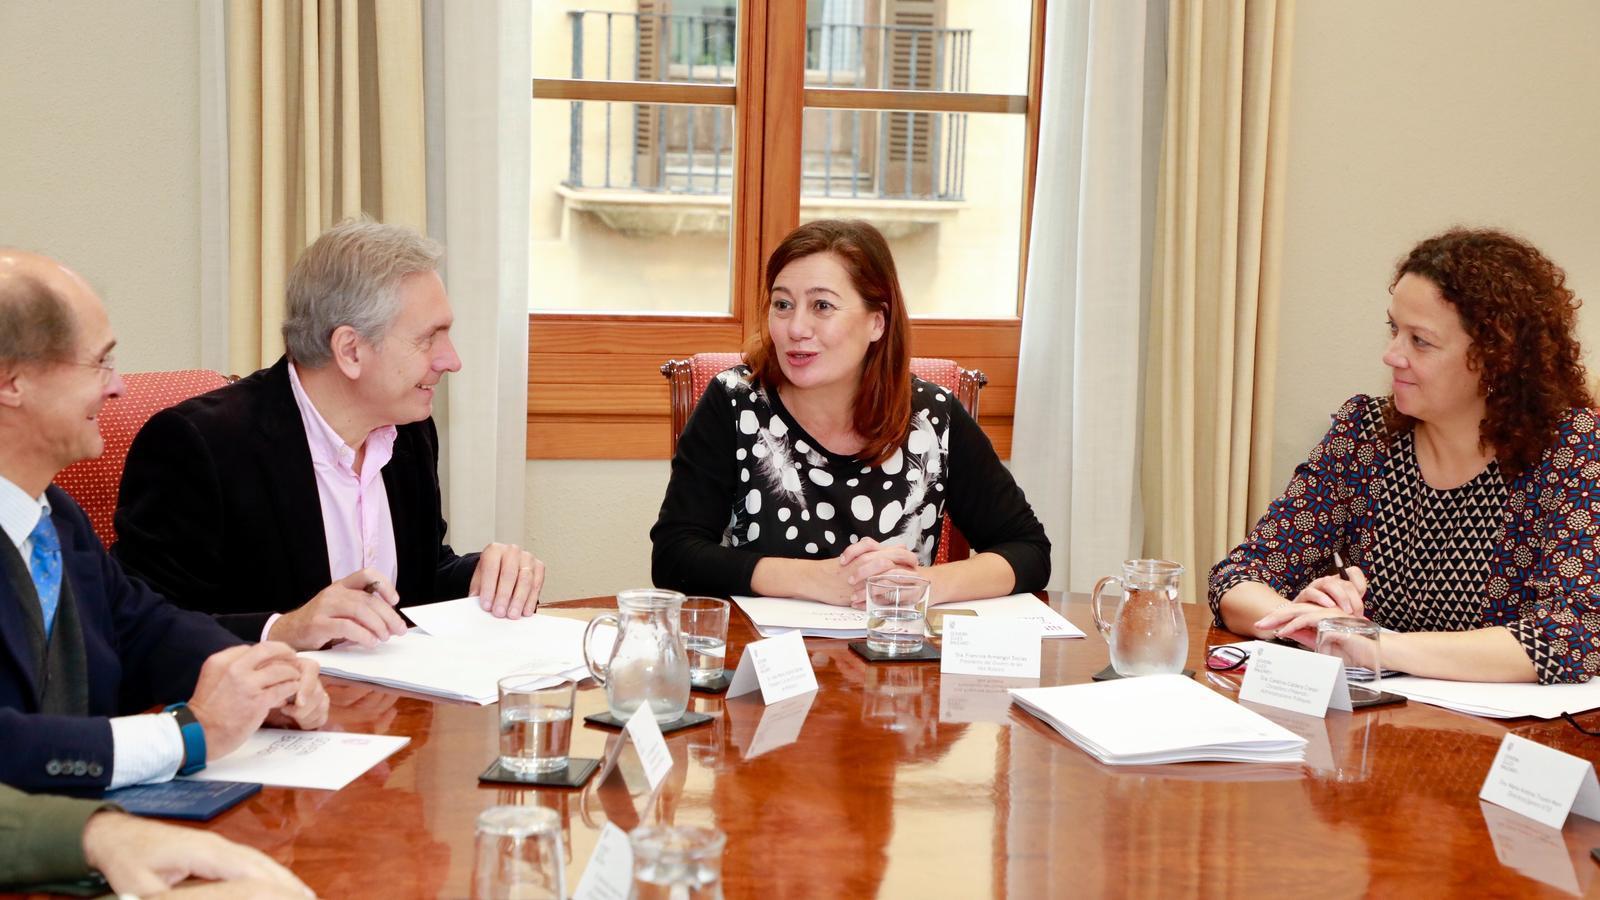 La presidenta Francina Armengol, la consellera Catalina Cladera i el president del Cercle d'Economia de Mallorca, José María Vicens